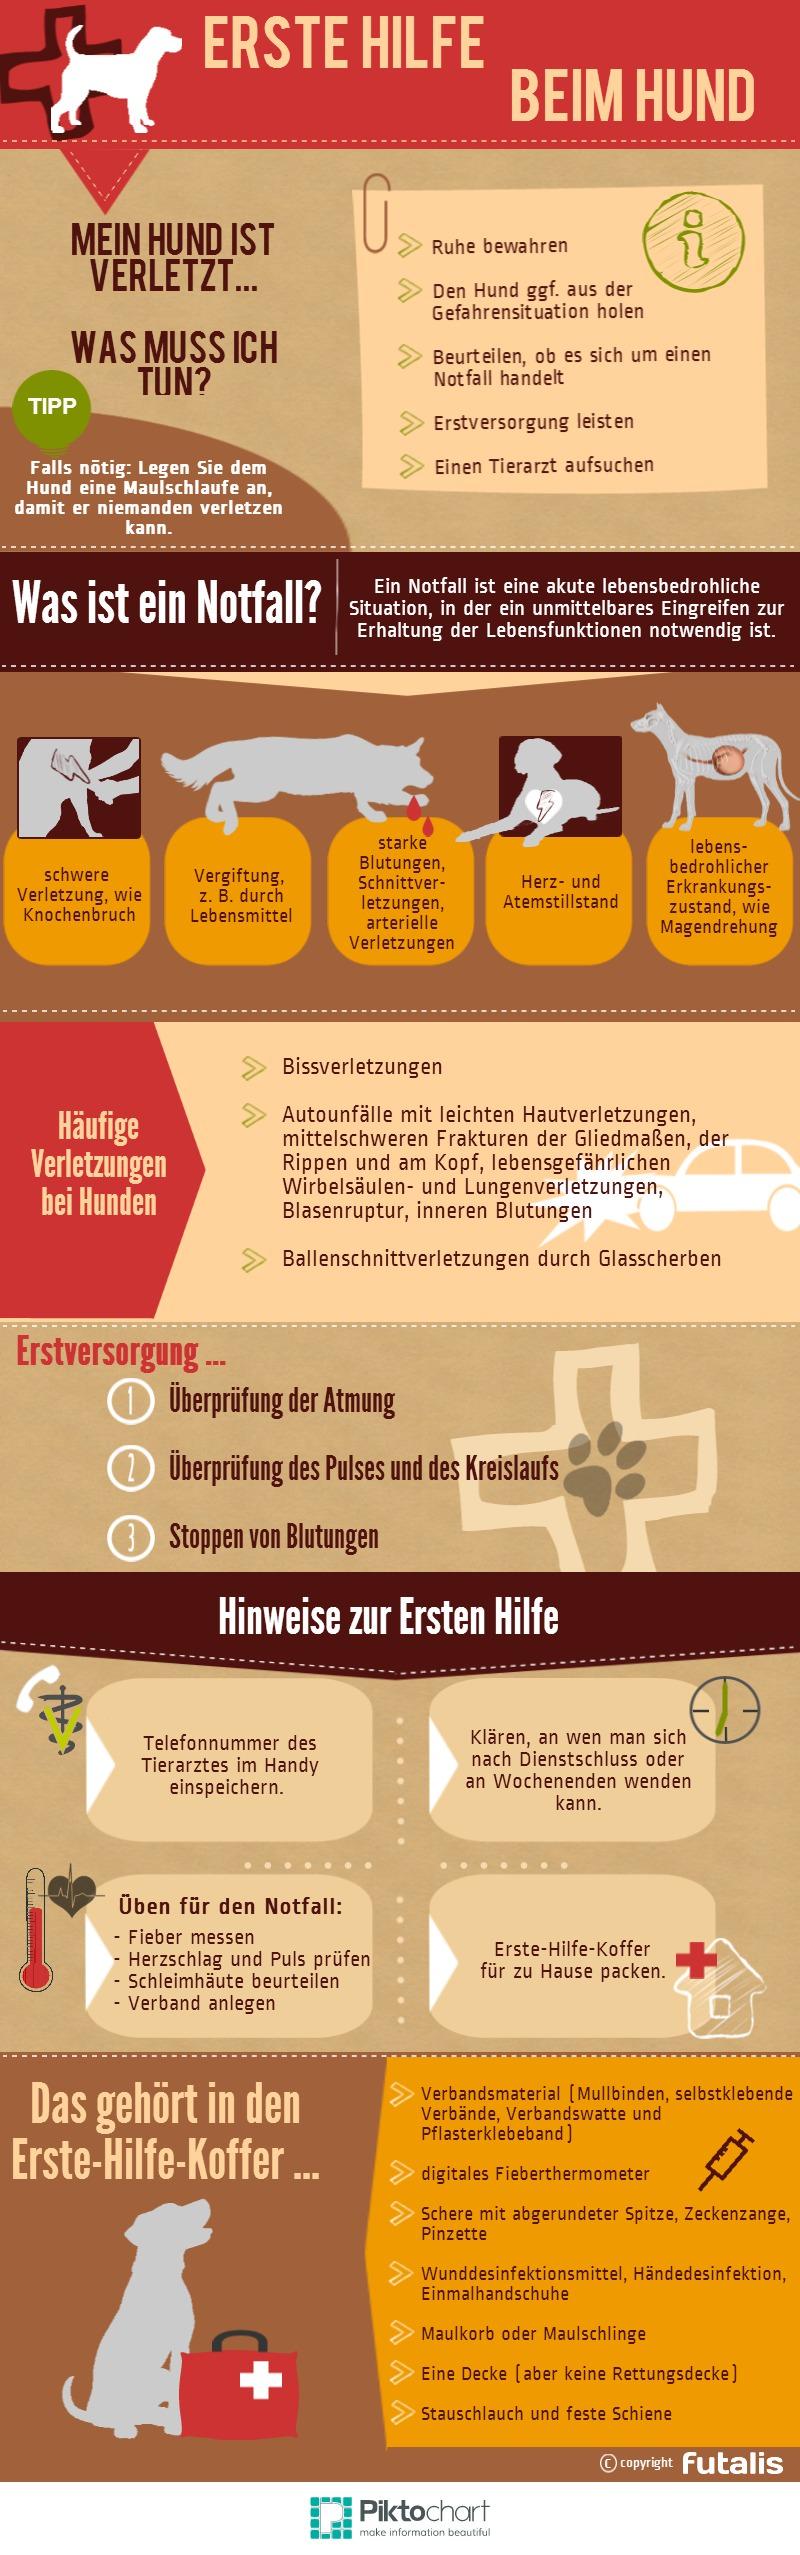 erste-hilfe-beim-hund-infografik.jpg